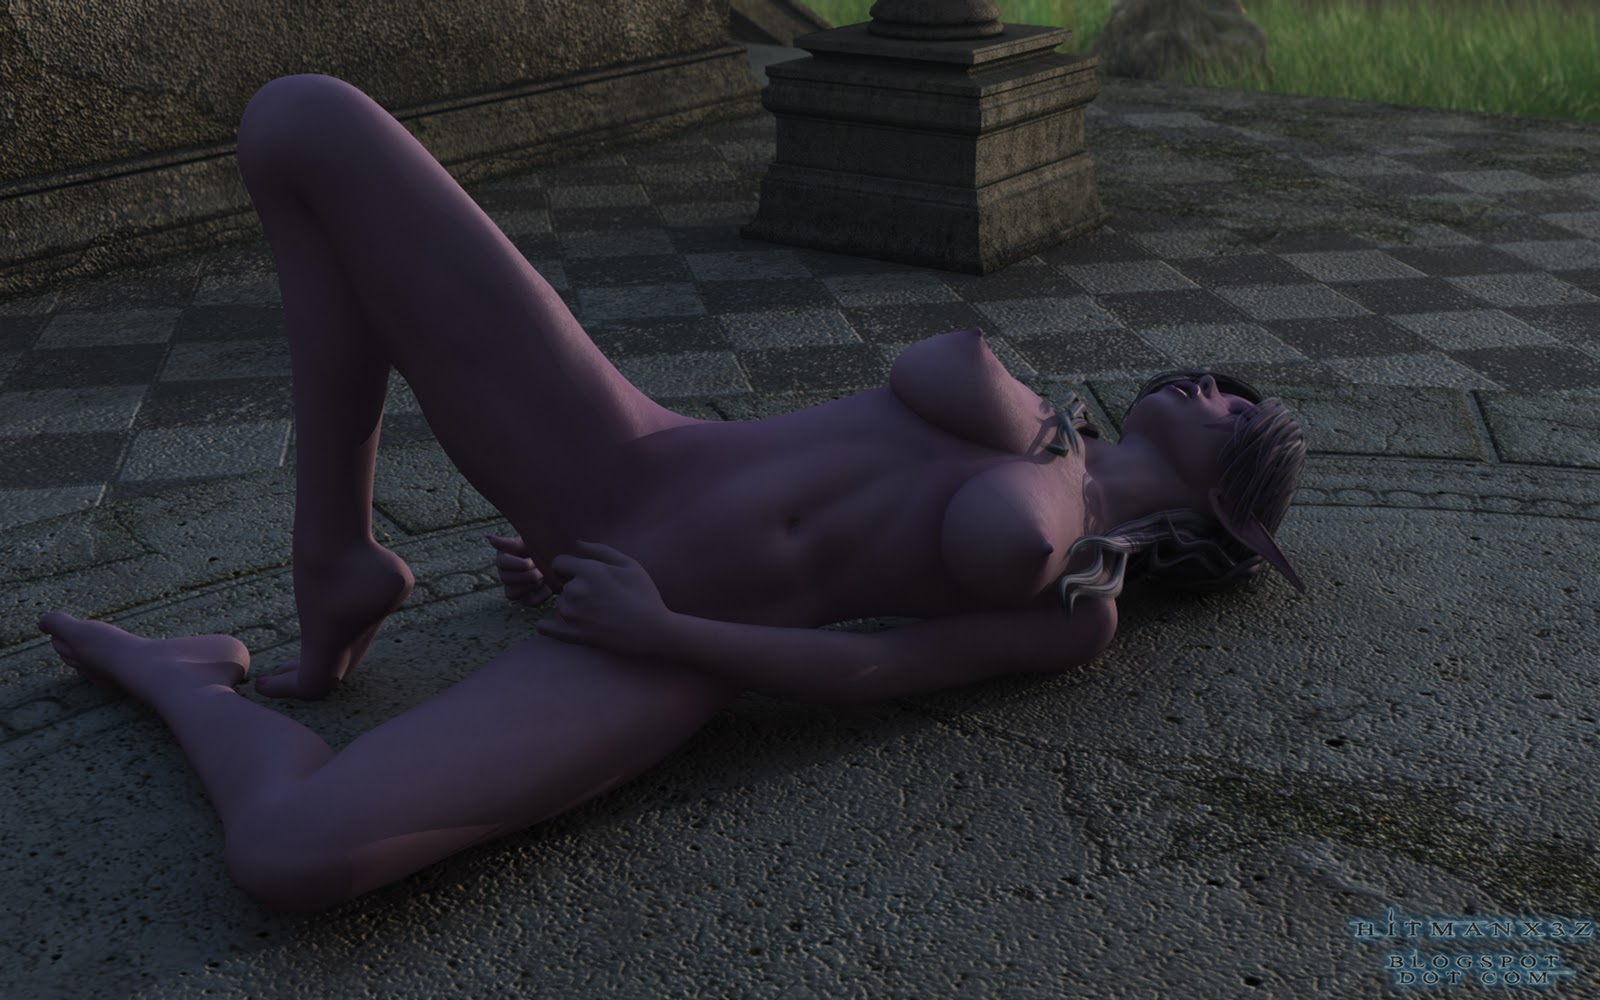 Blue girl nude 3d cartoon wallpaper erotic tube